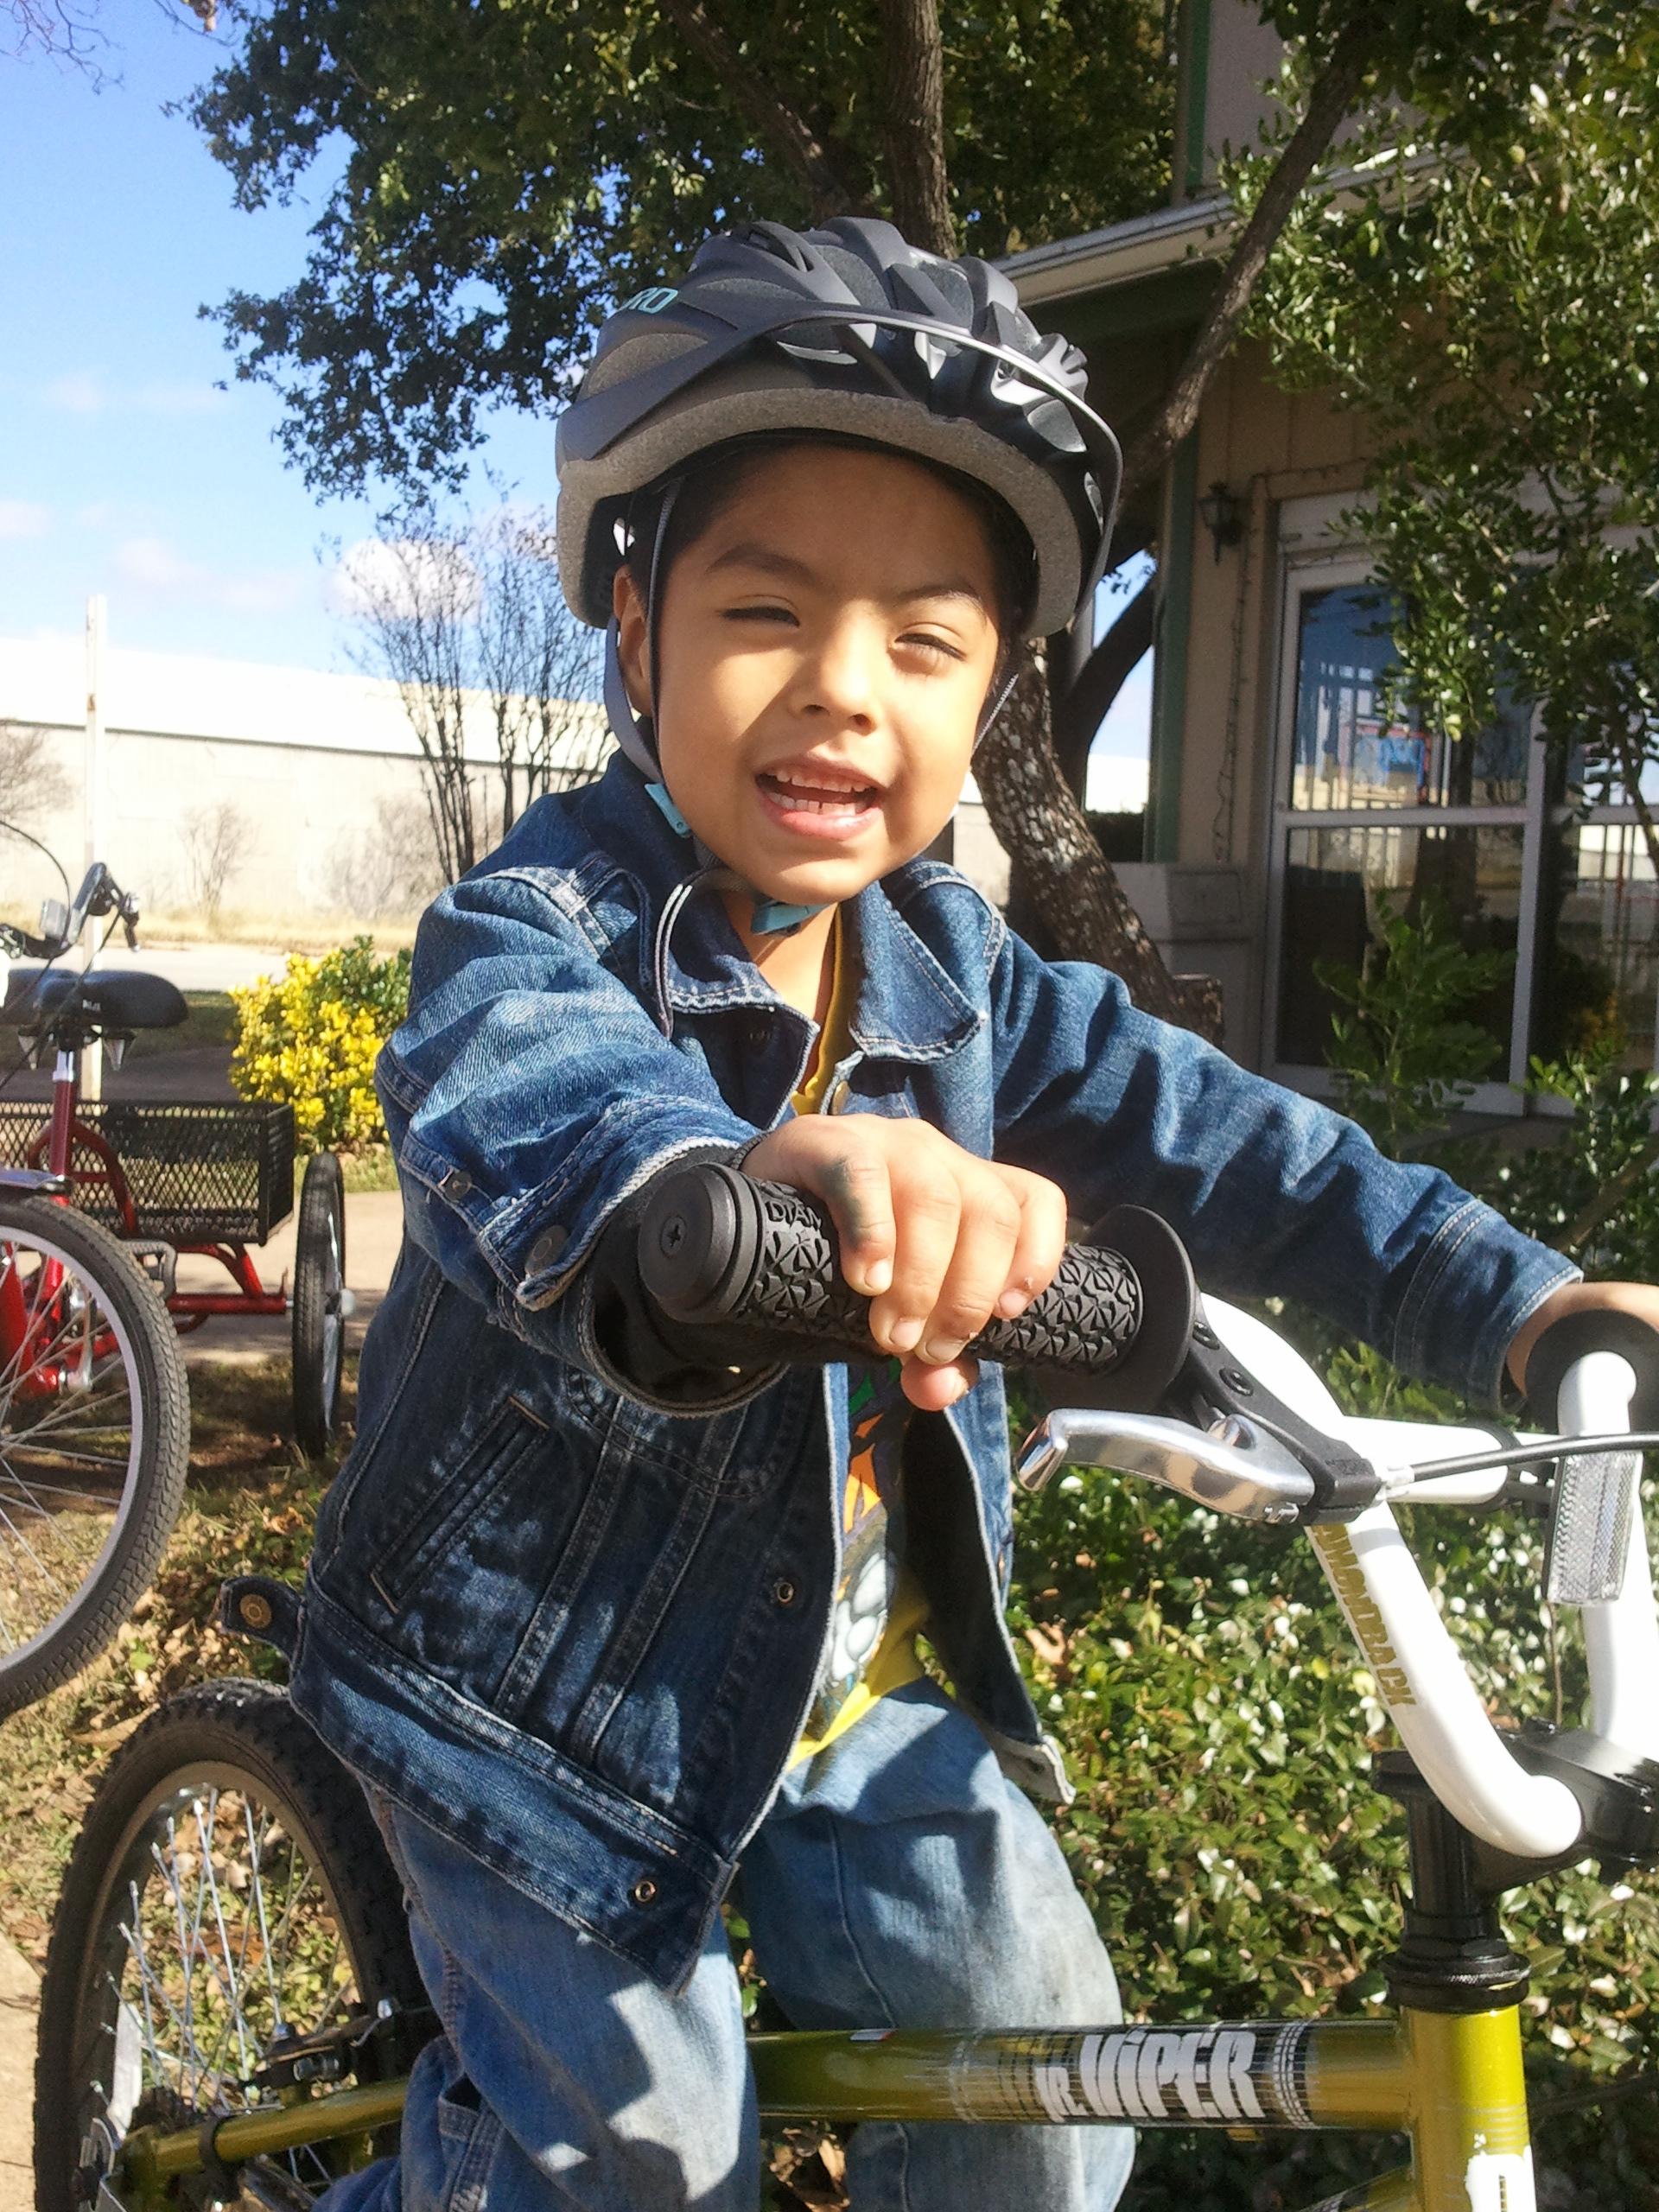 Boy and Bike charity corporate charity bike build team building